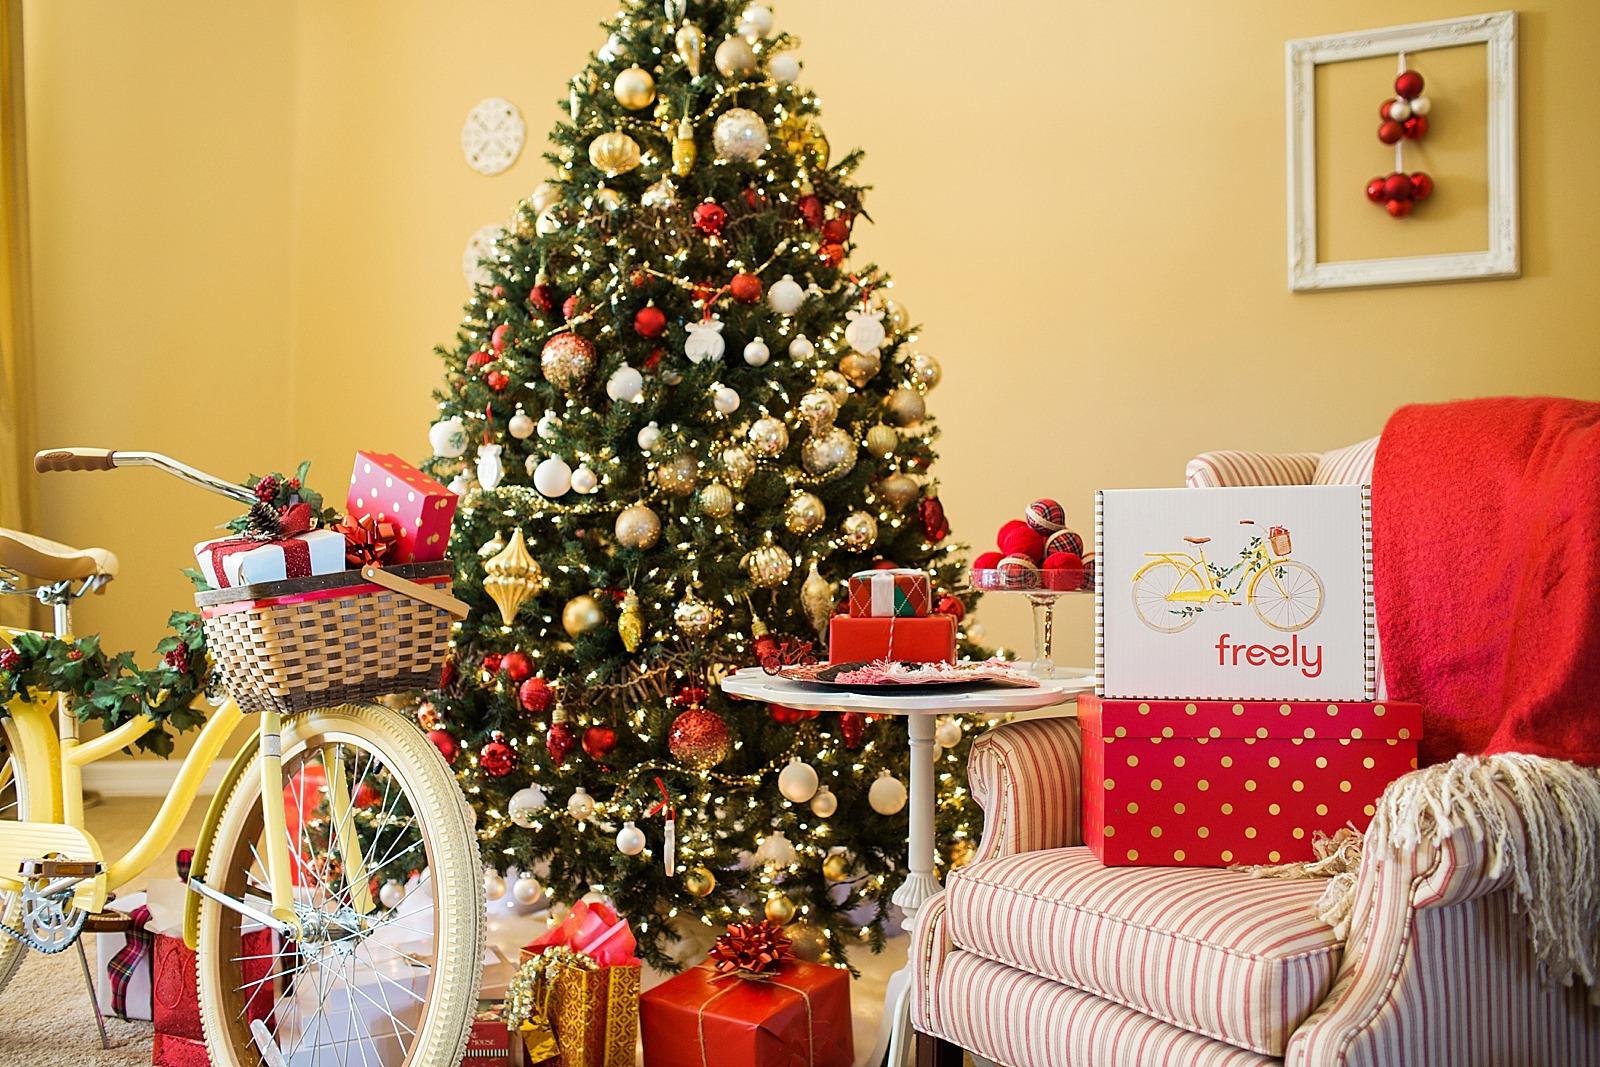 freely-2015-christmas-0454